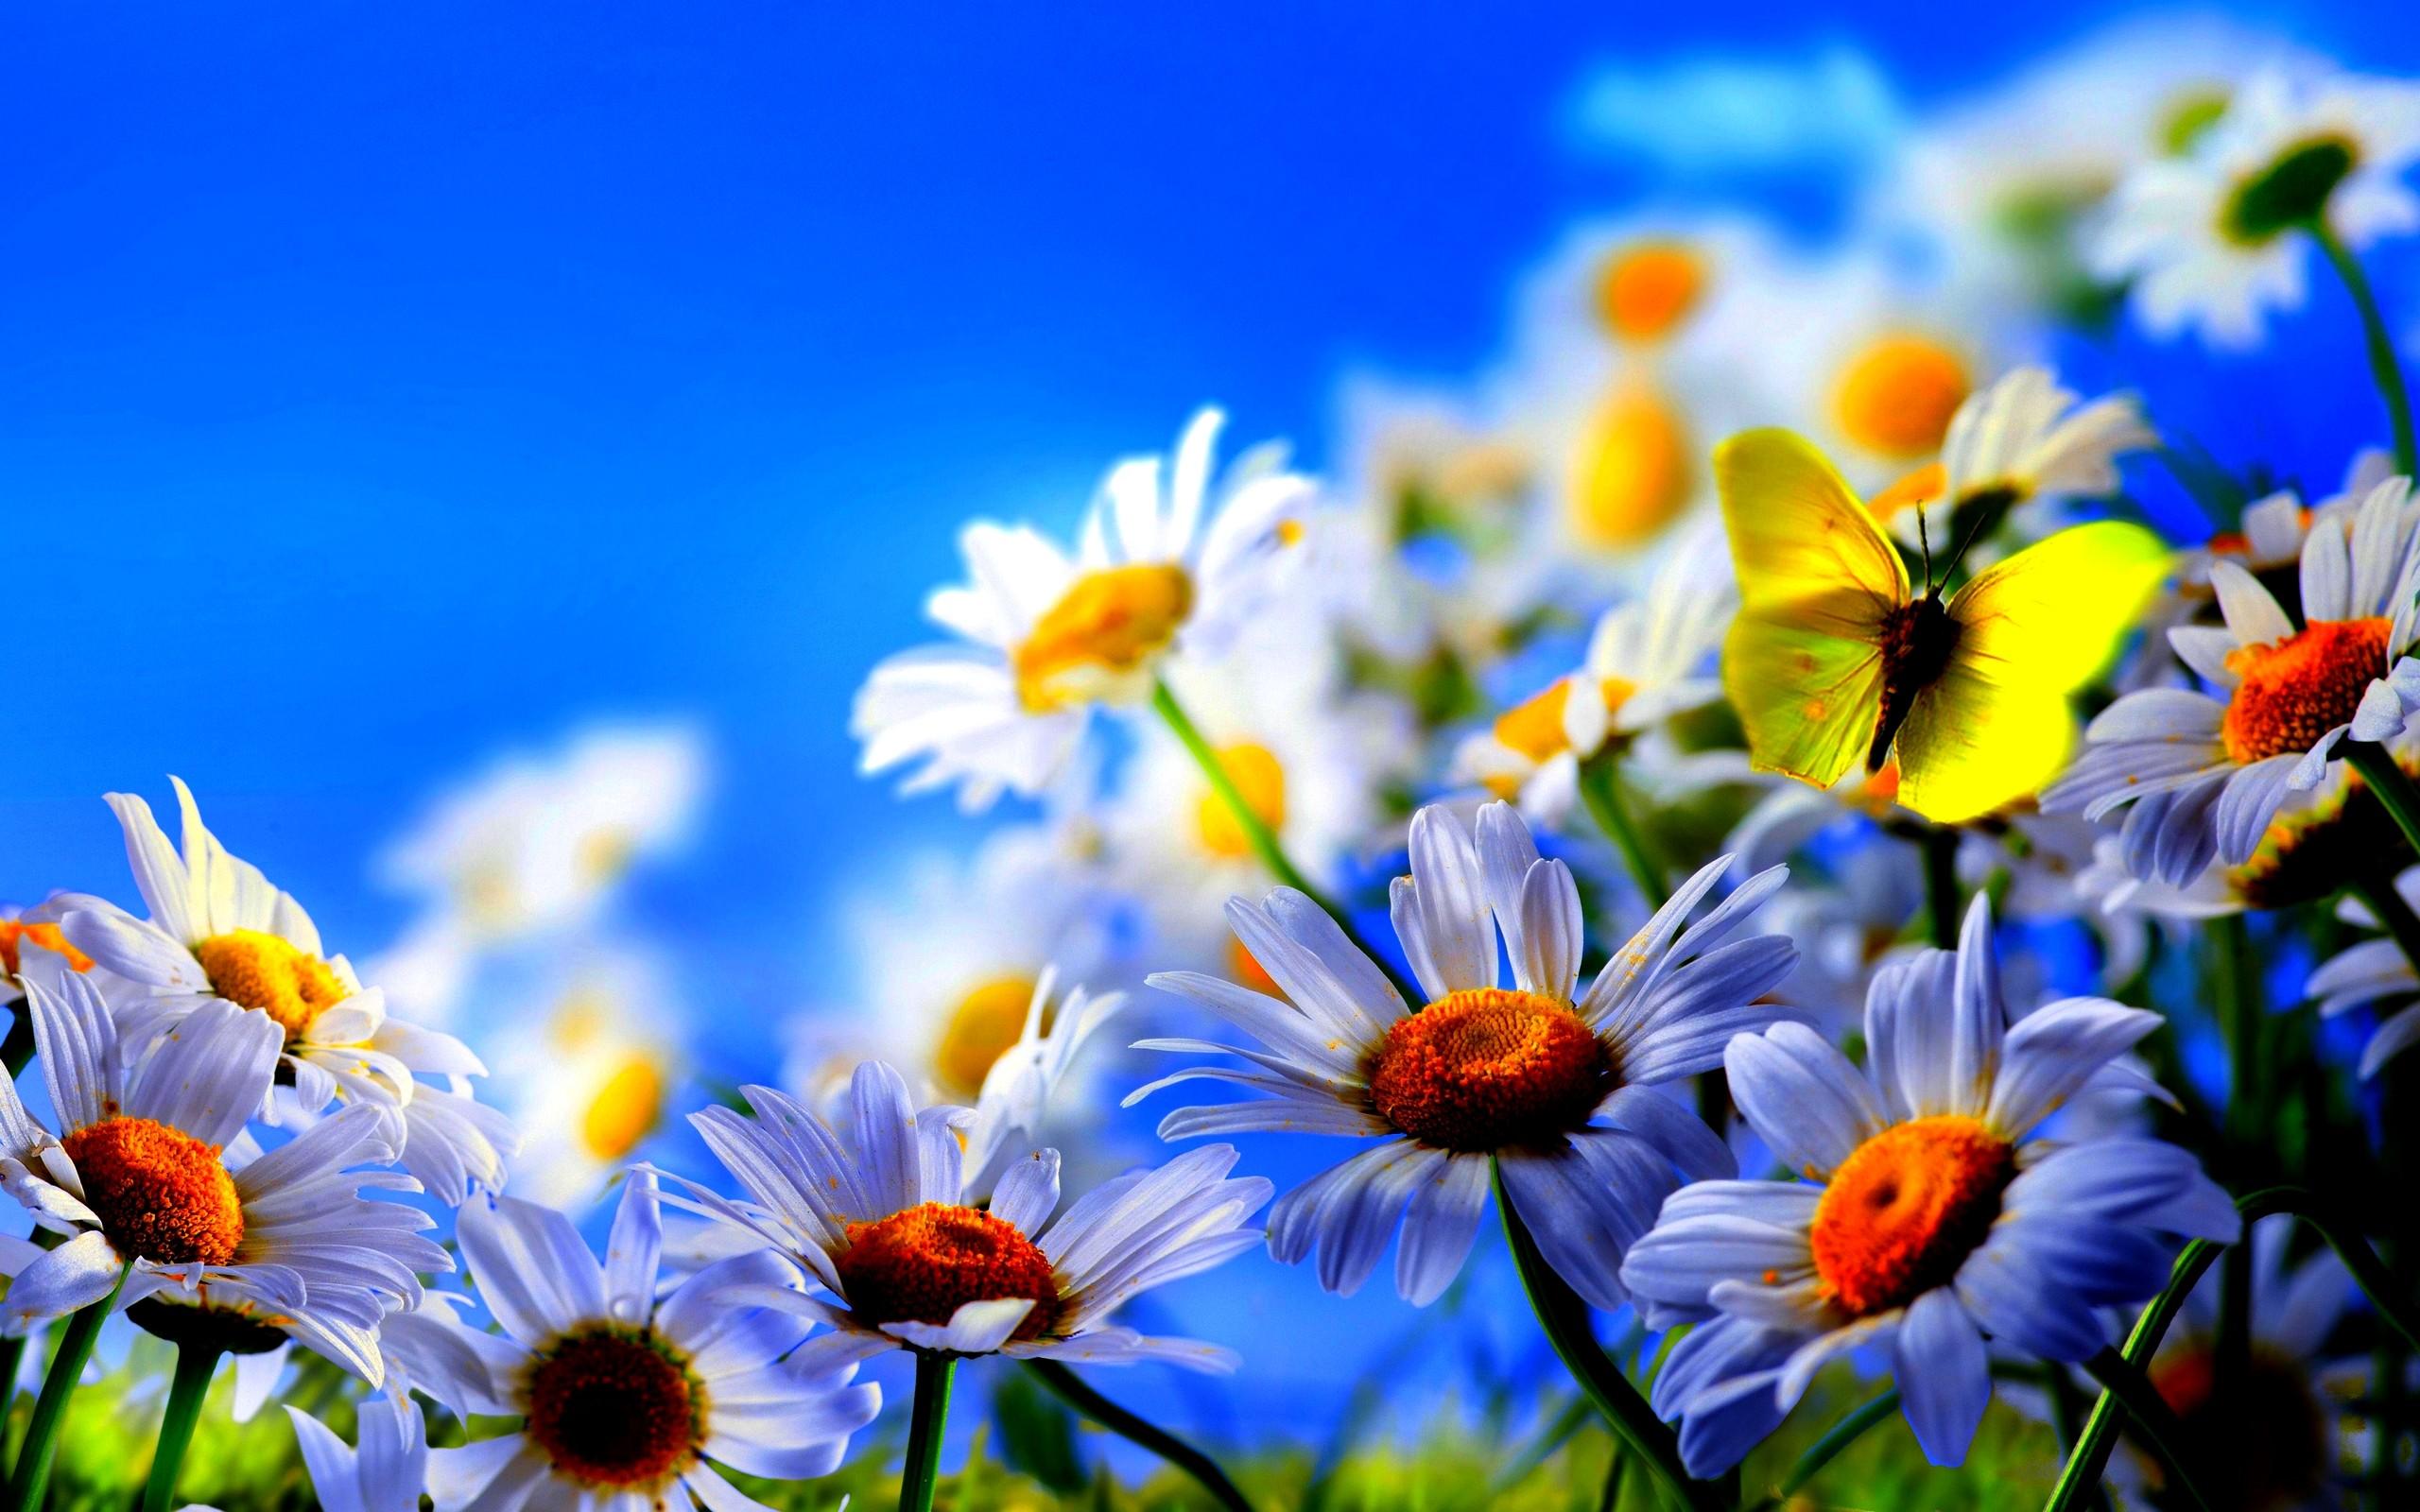 Spring Flowers Butterflies Background Hd Wallpaper - Spring Wallpaper Desktop - HD Wallpaper